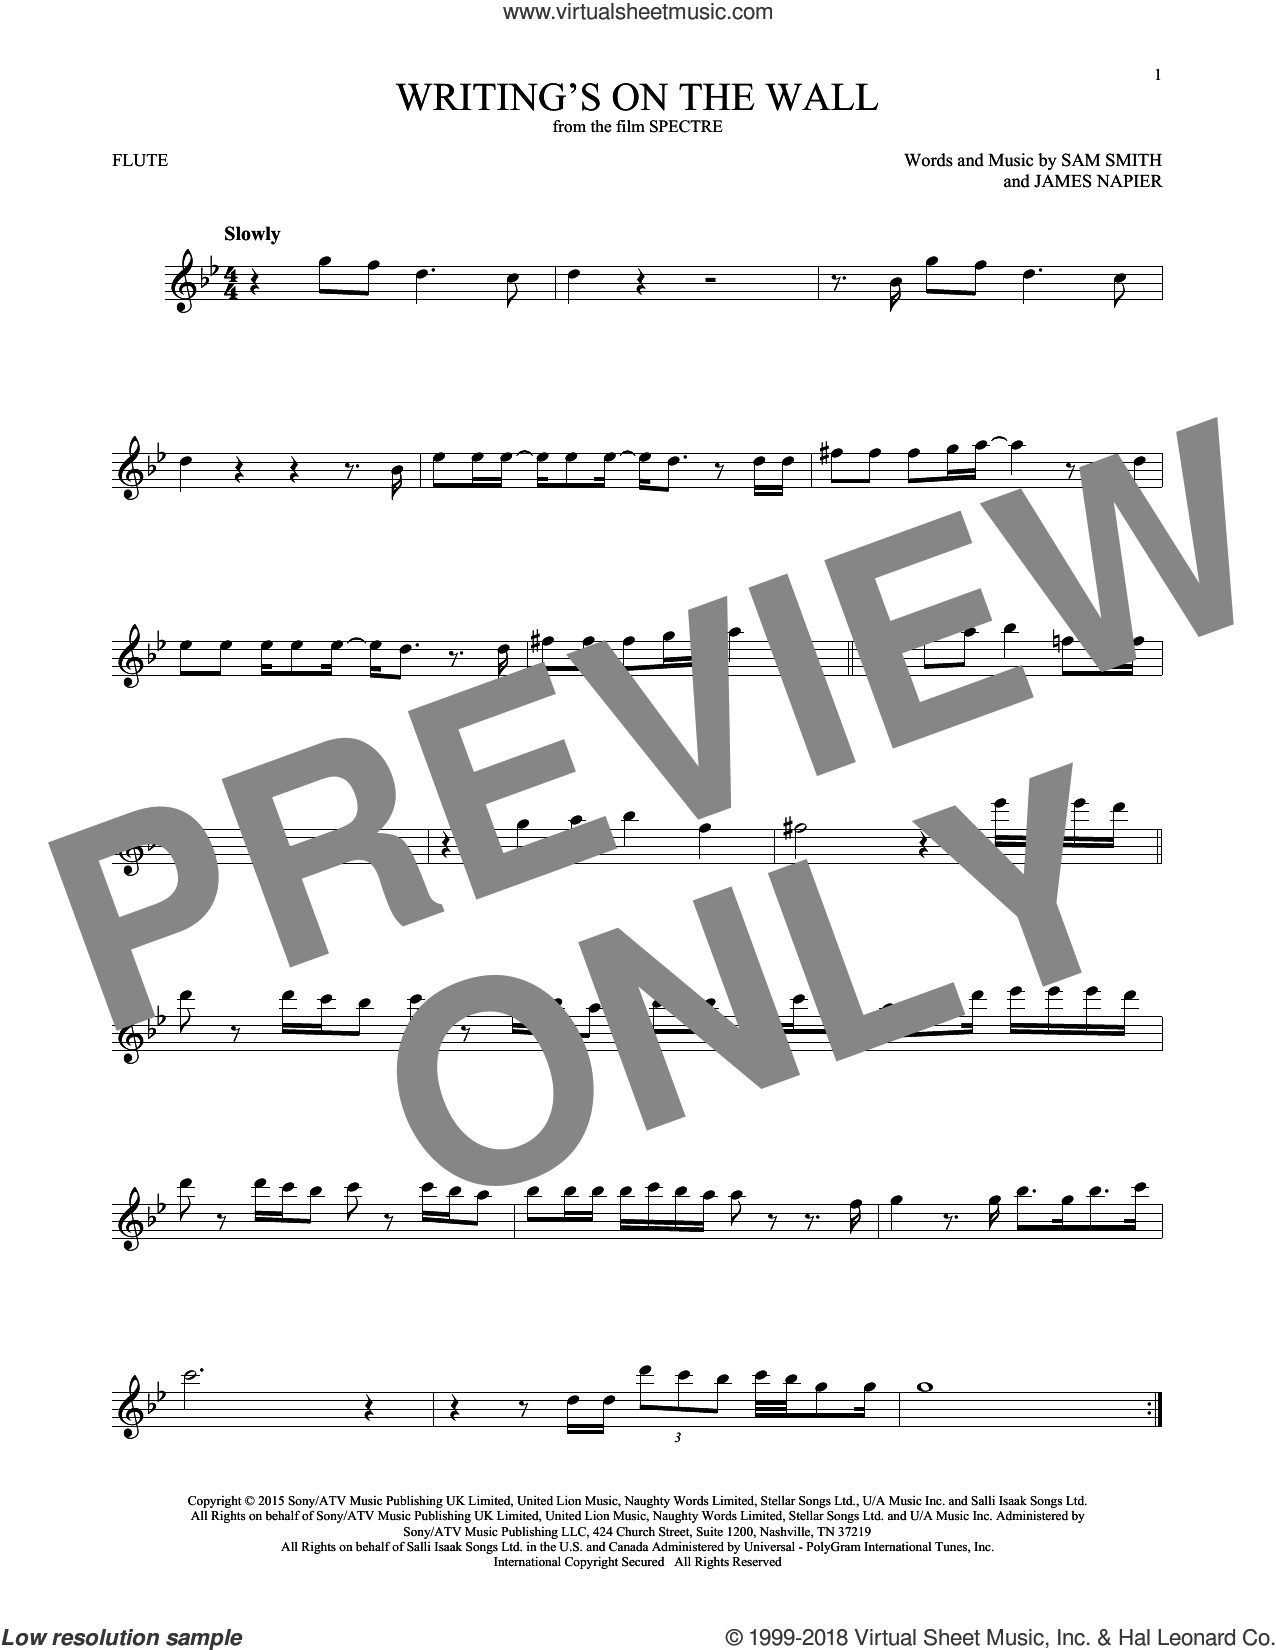 writings on the wall sheet music pdf